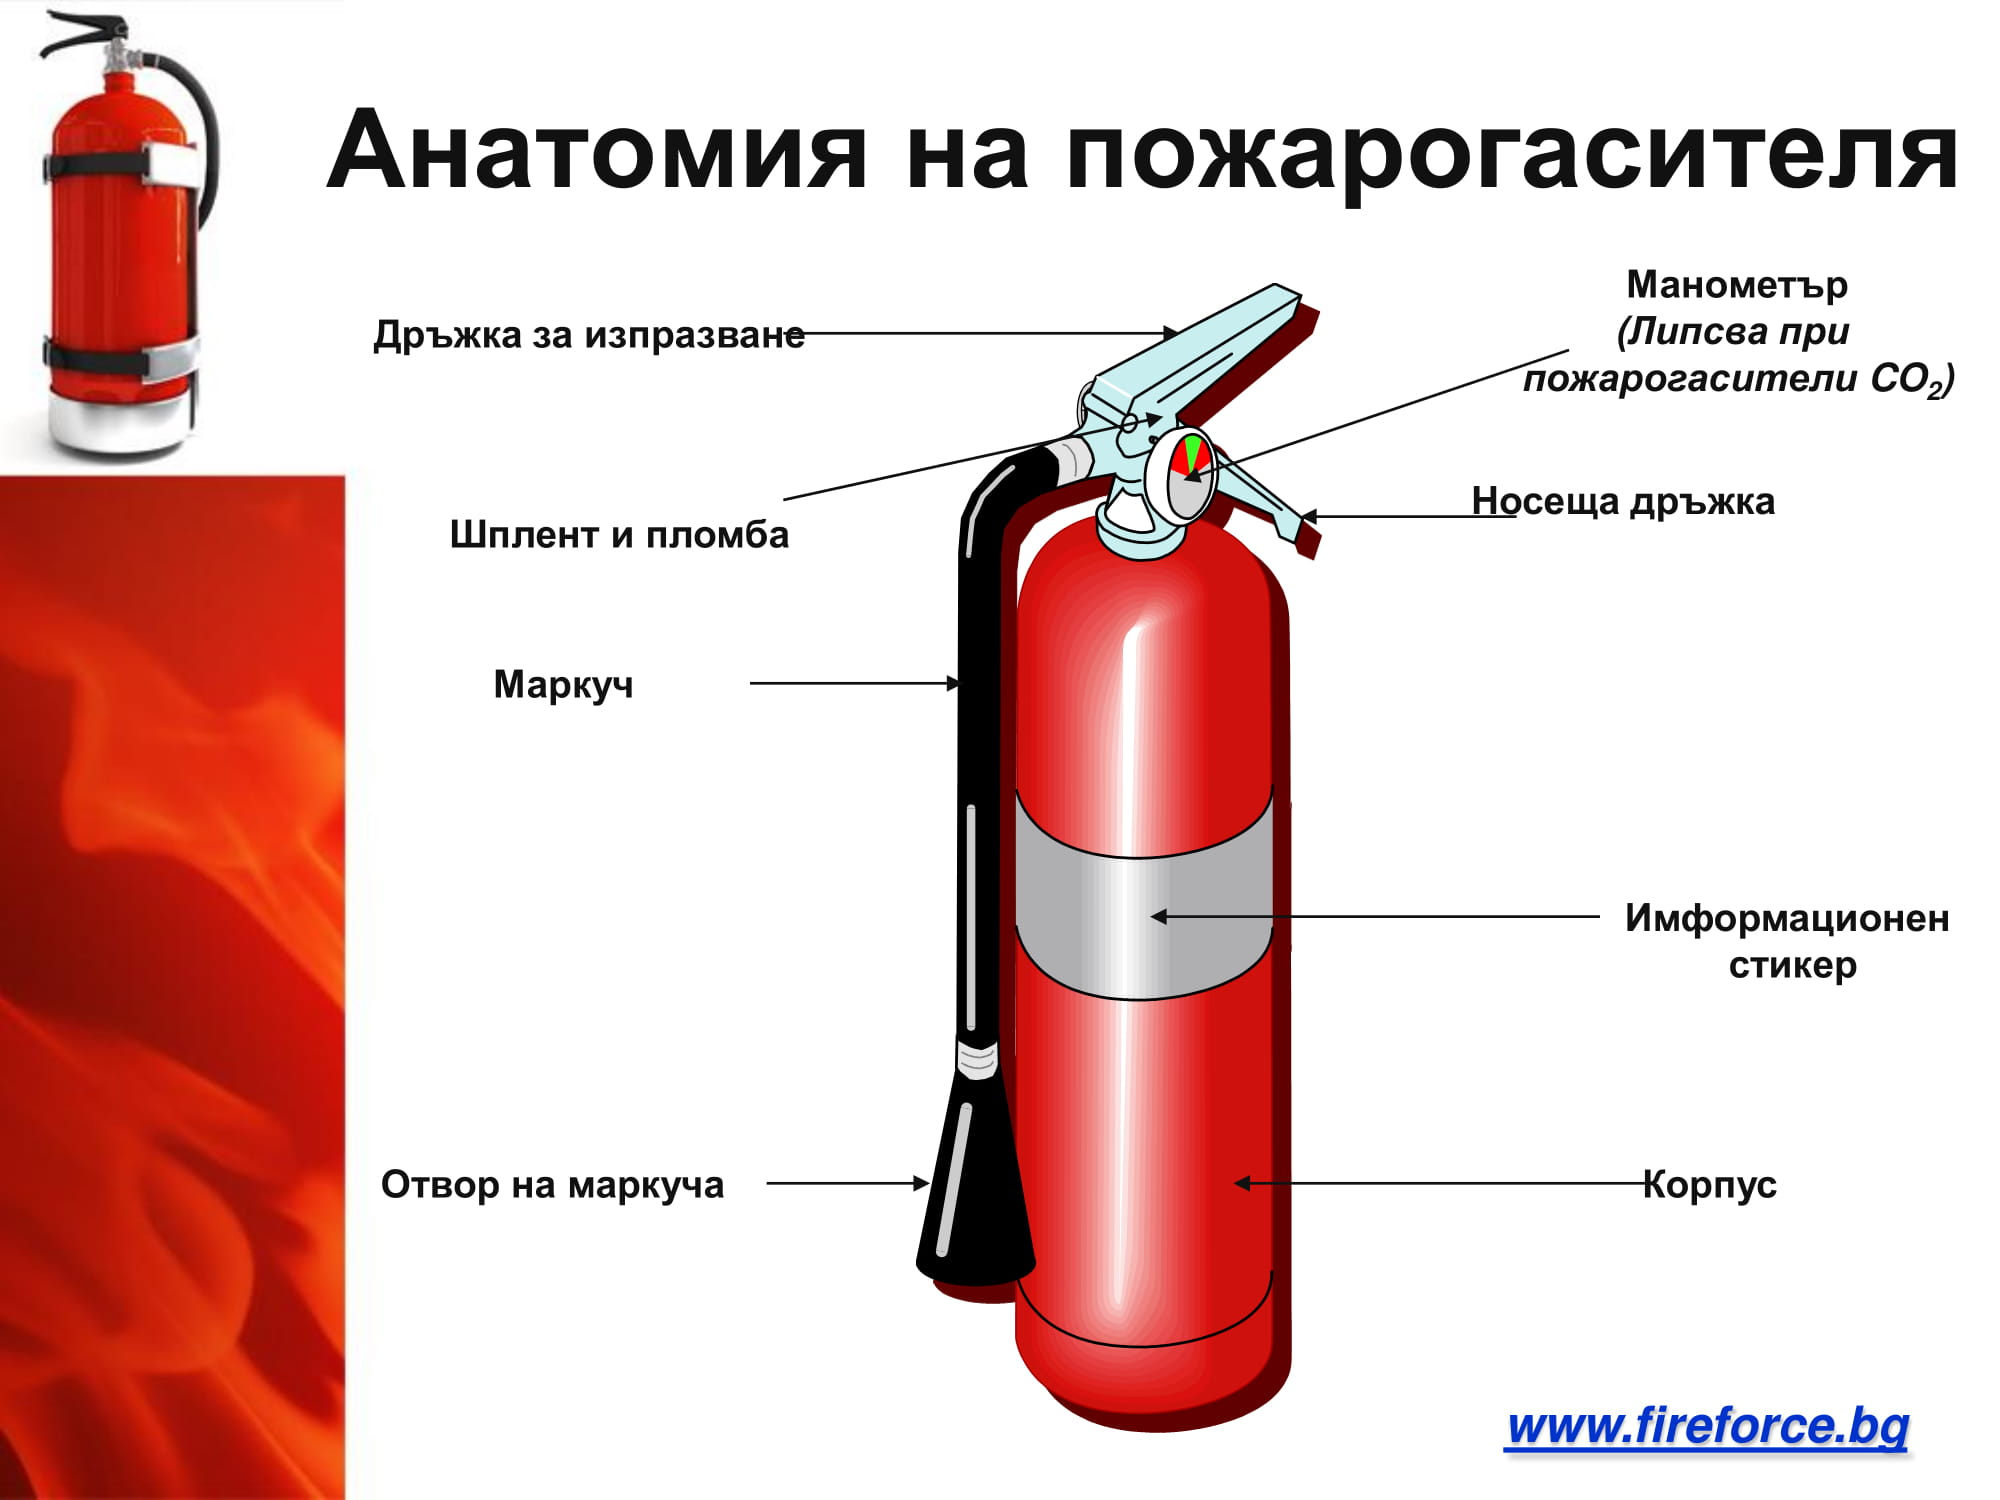 Устройство на пожарогасителя